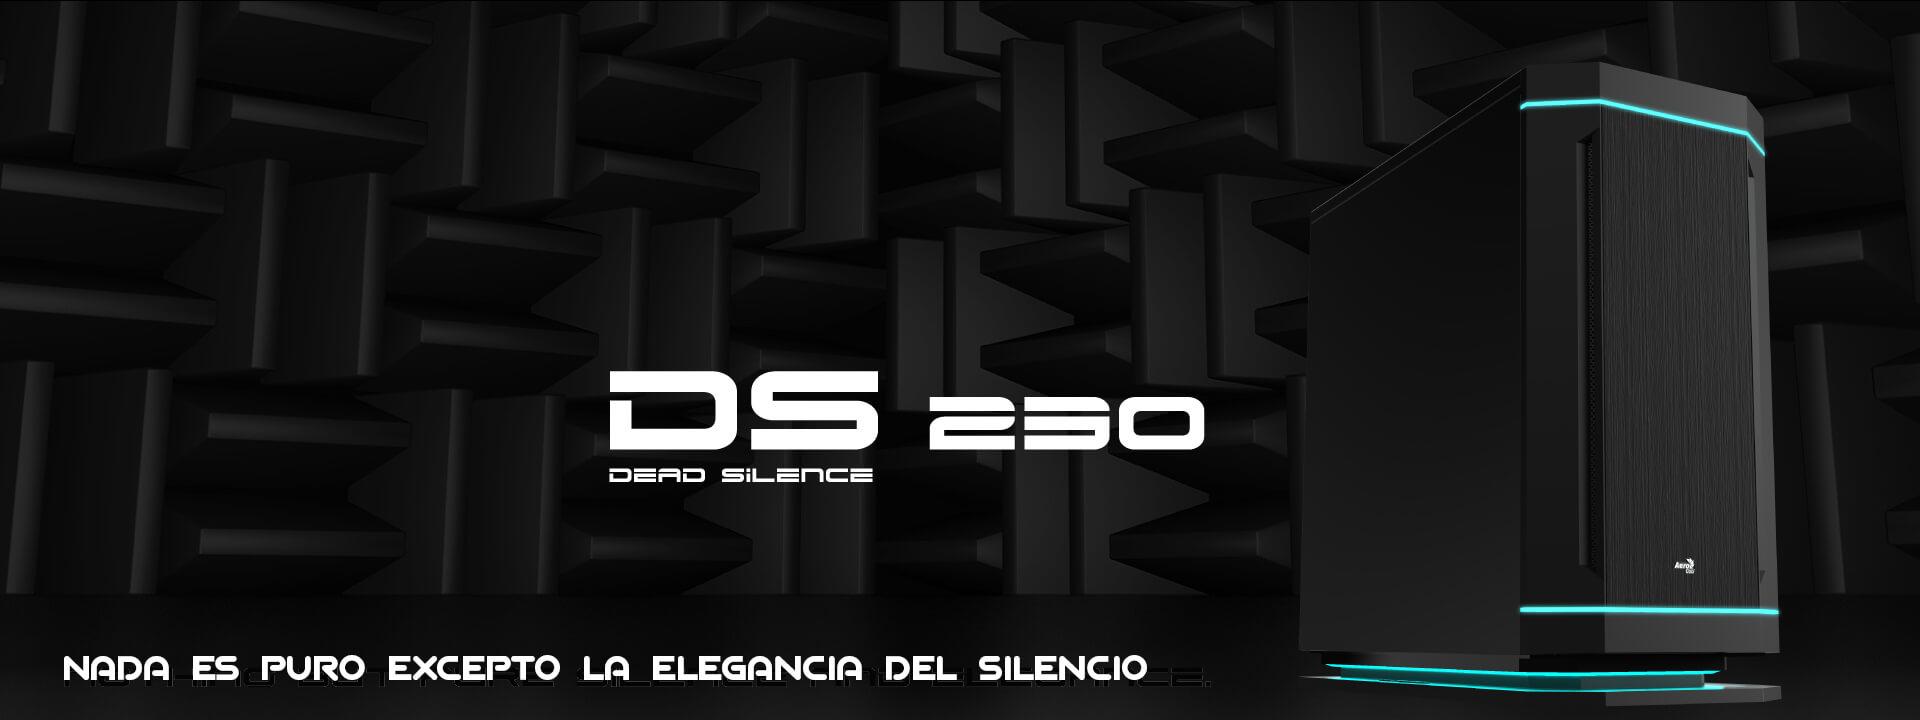 DS-230